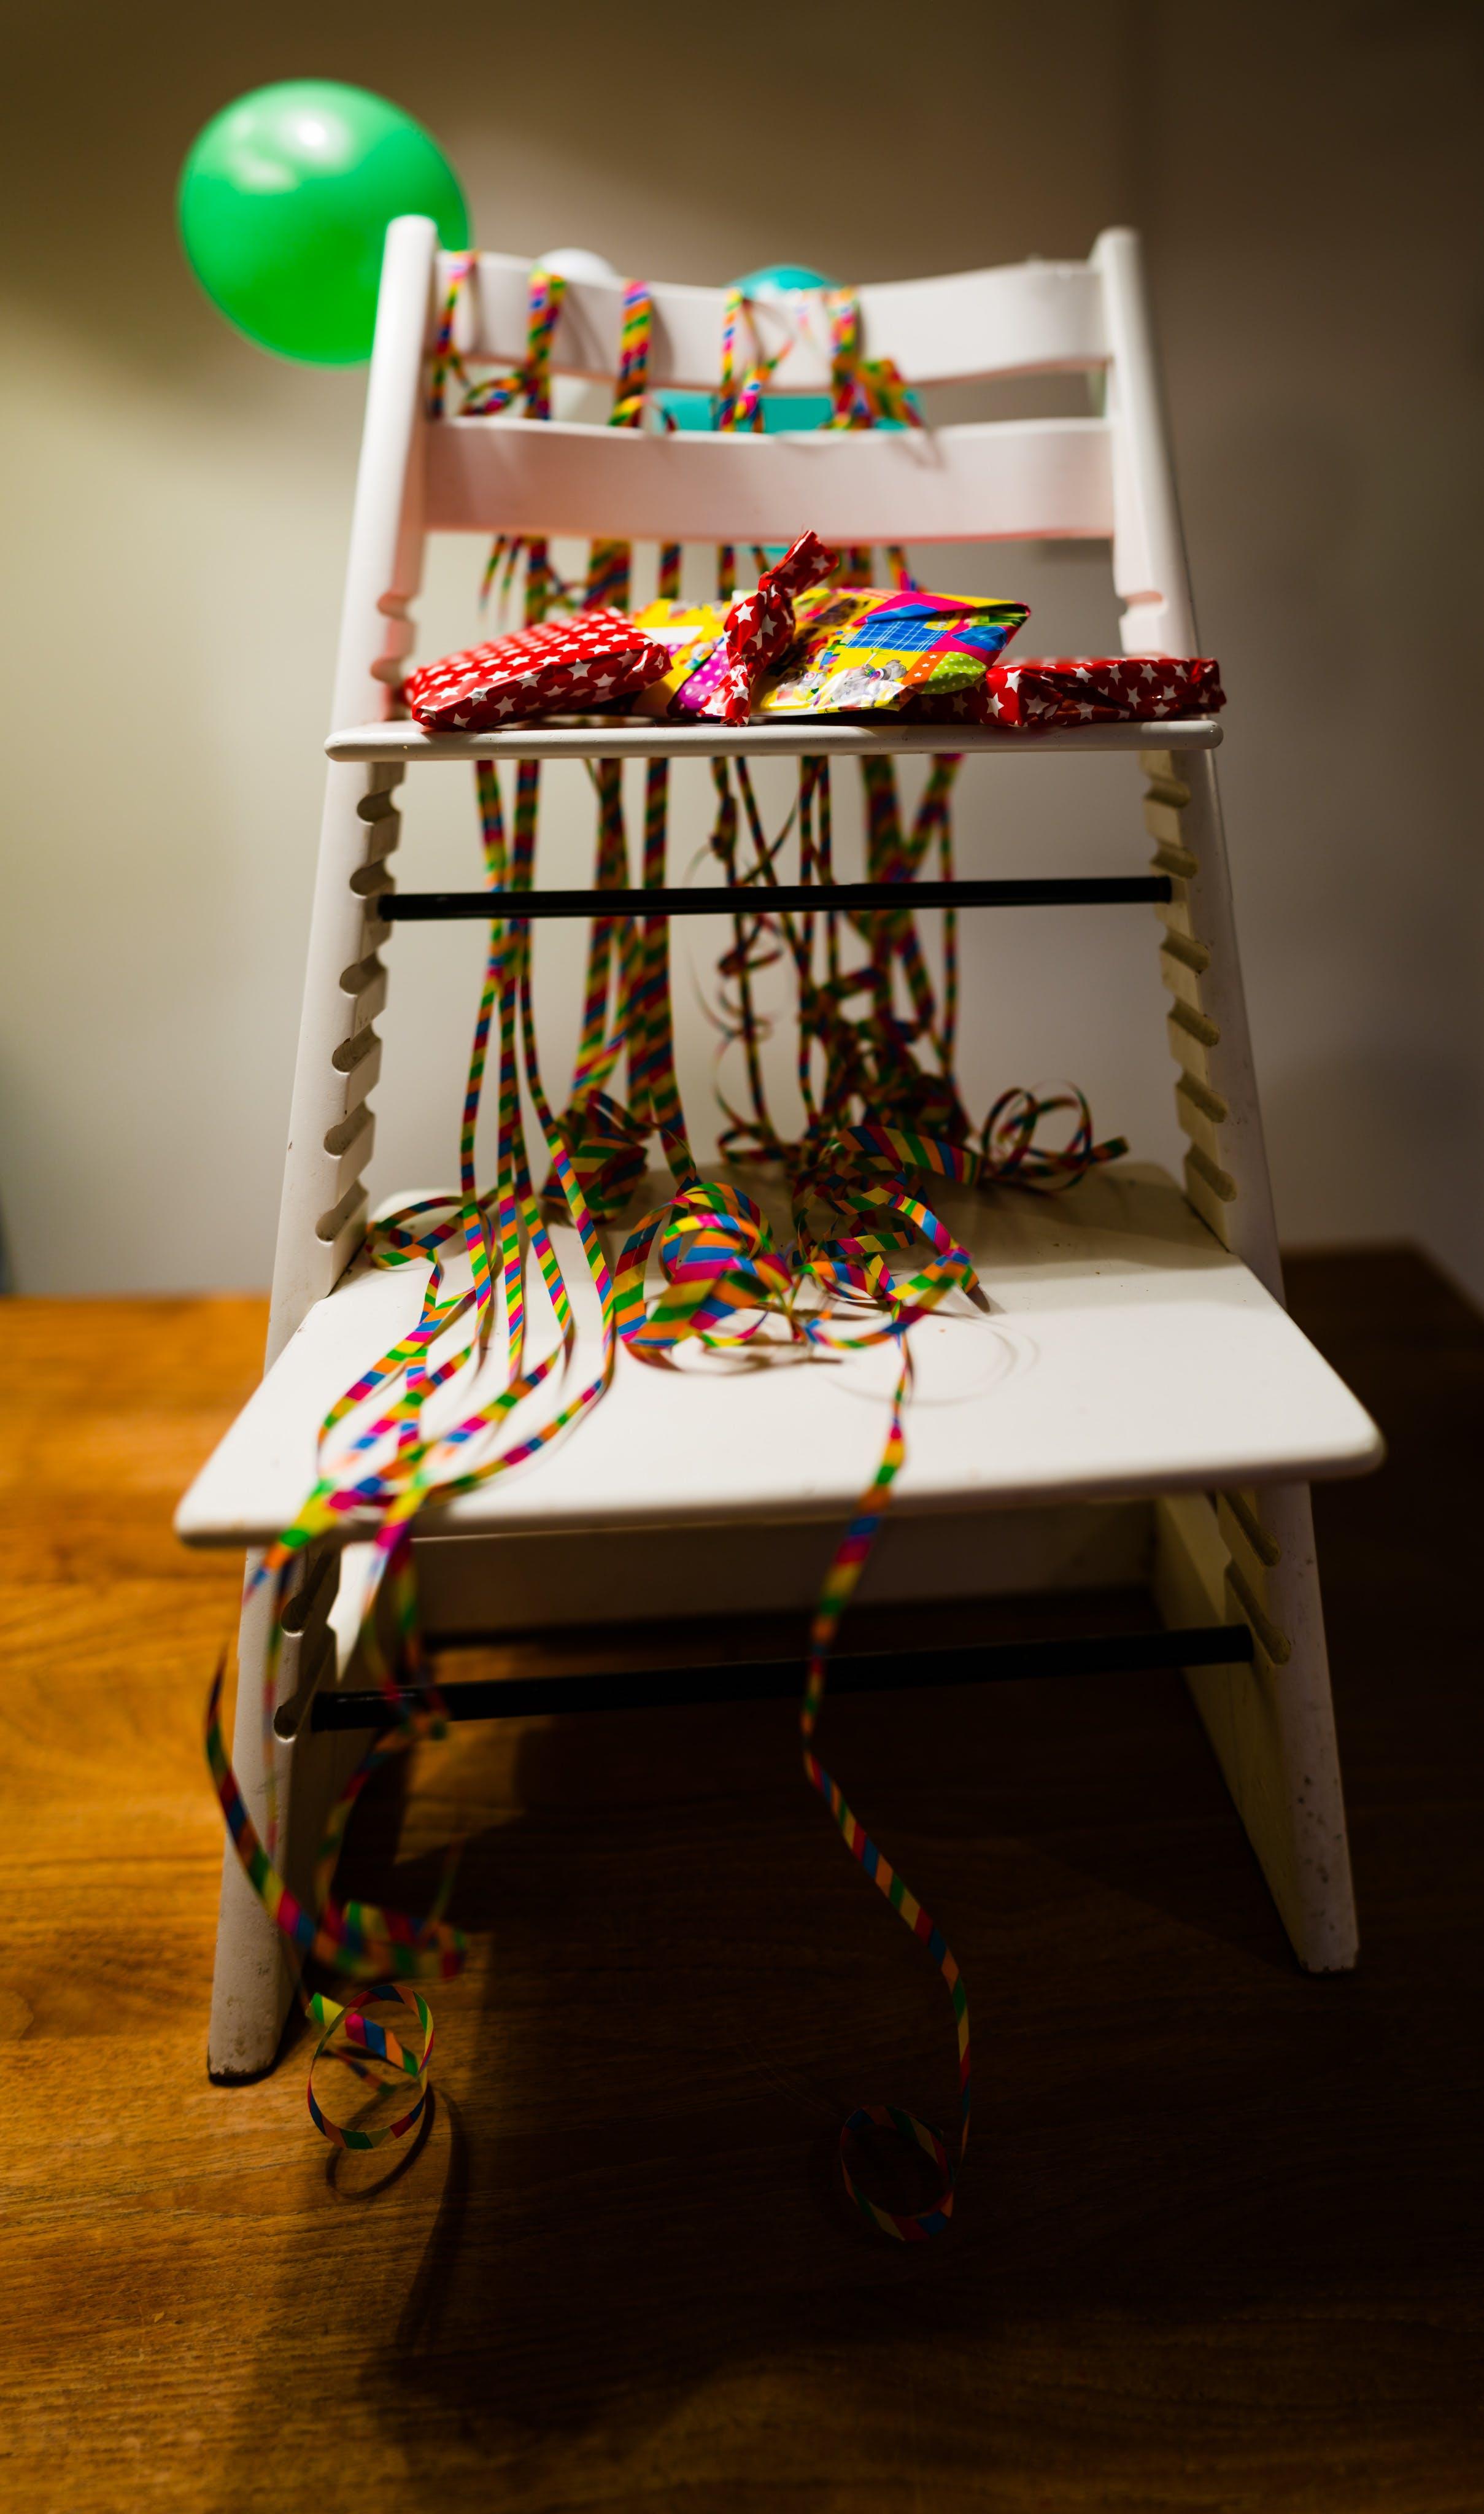 Free stock photo of balloon, chair, birthday, presents